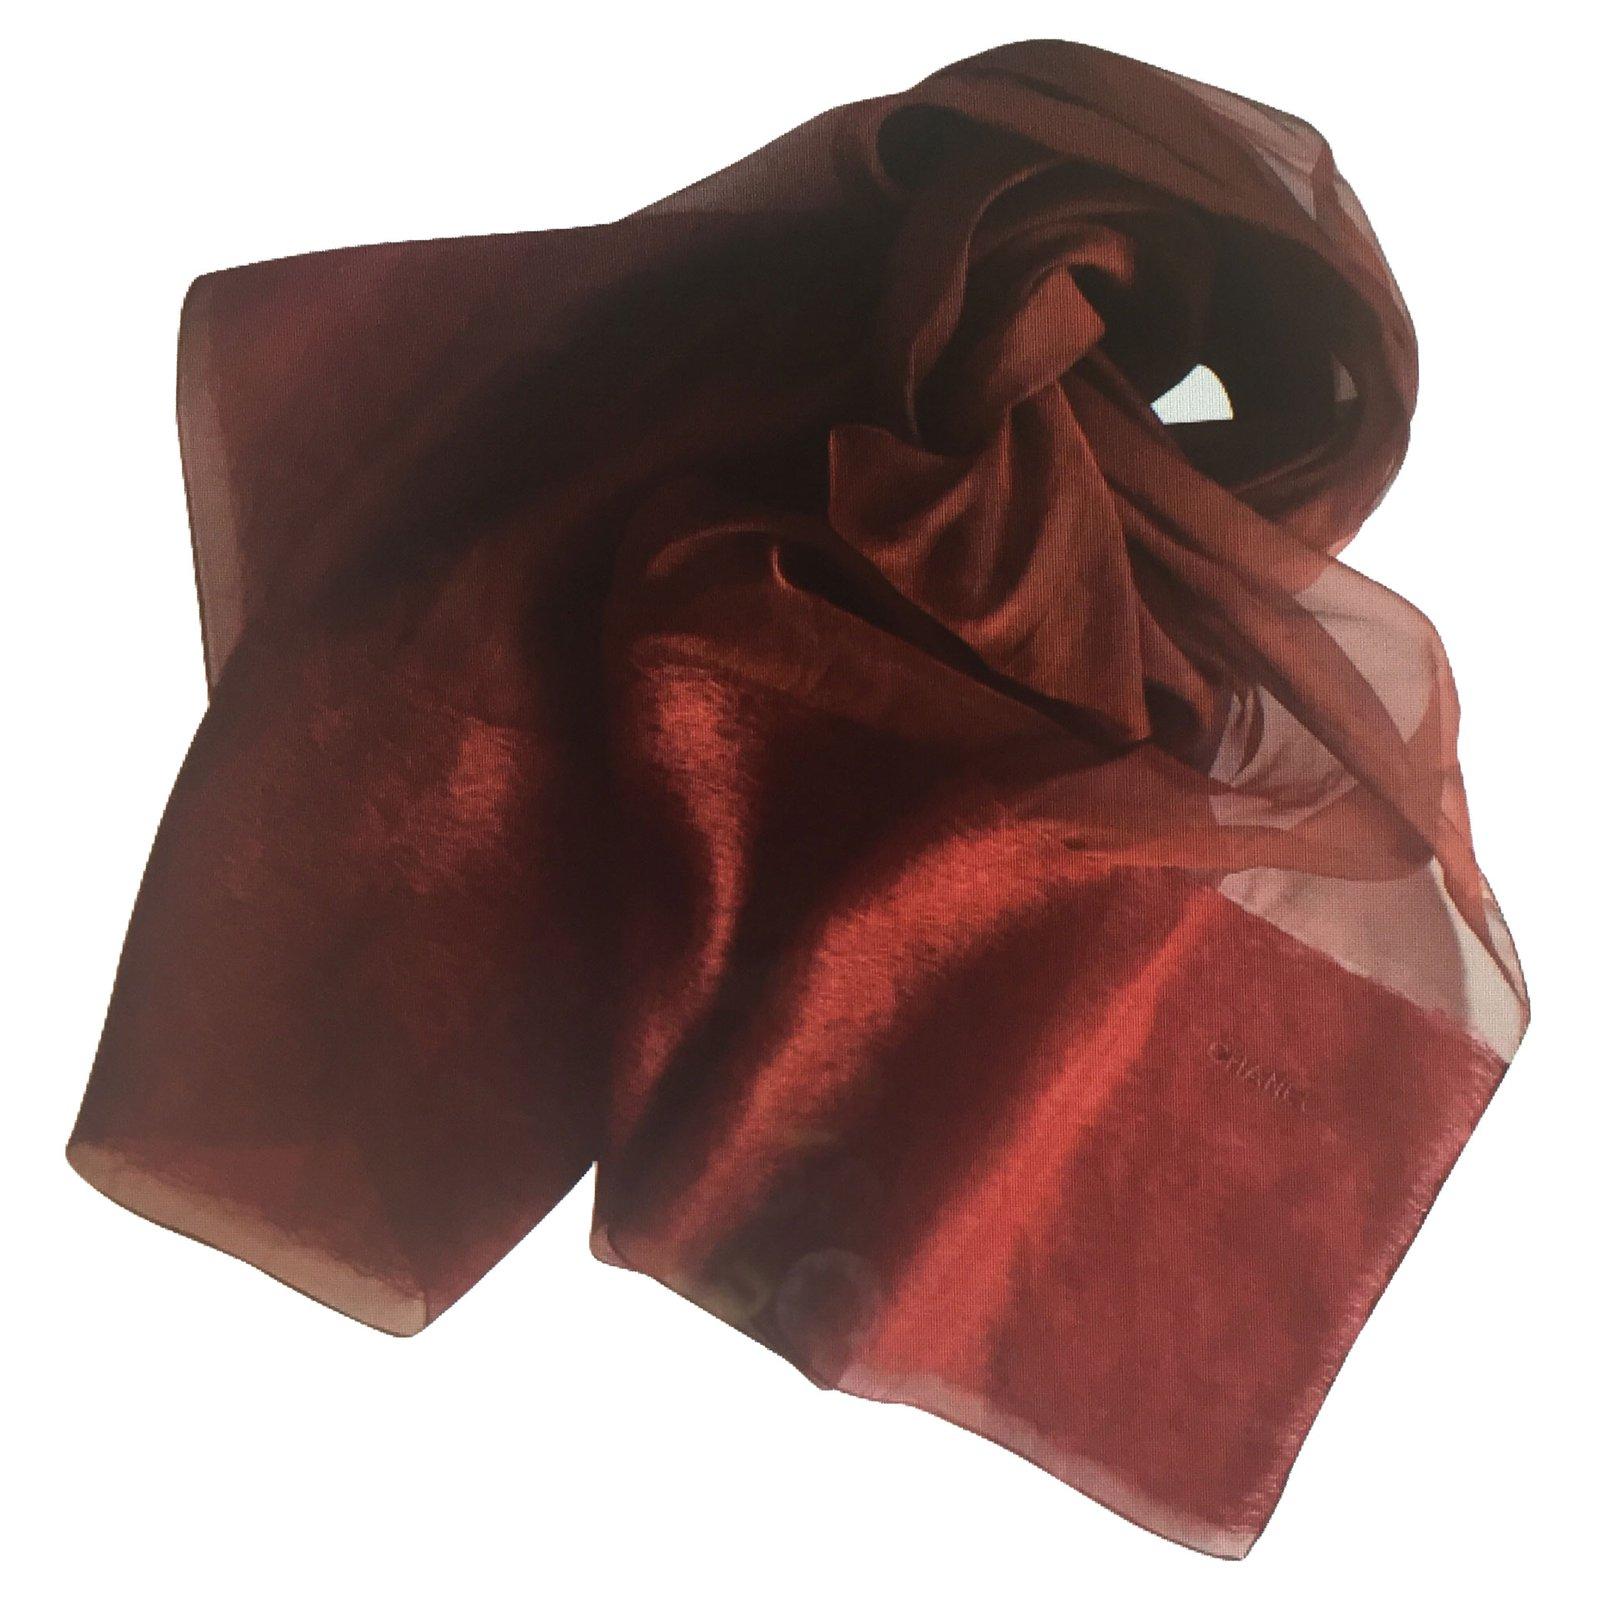 Foulards Chanel Foulard Soie Bordeaux ref.69587 - Joli Closet 8f5d622b27f